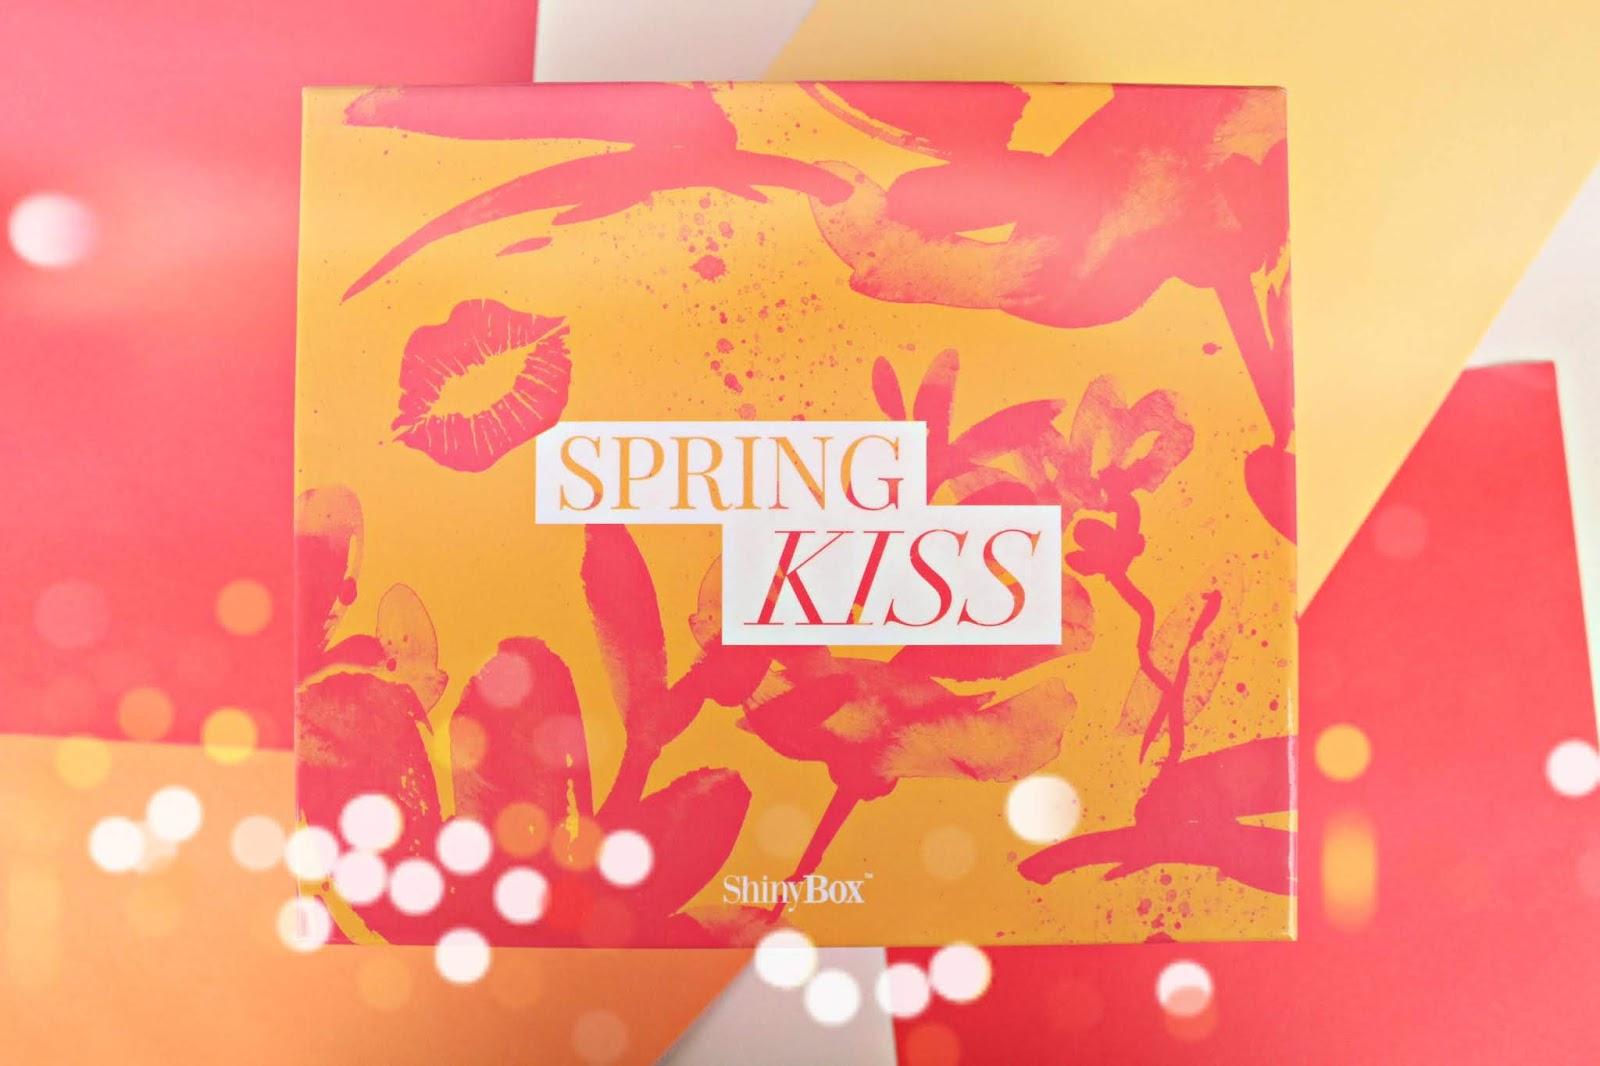 SHINYBOX - SPRING KISS - kwiecień 2019 - openbox